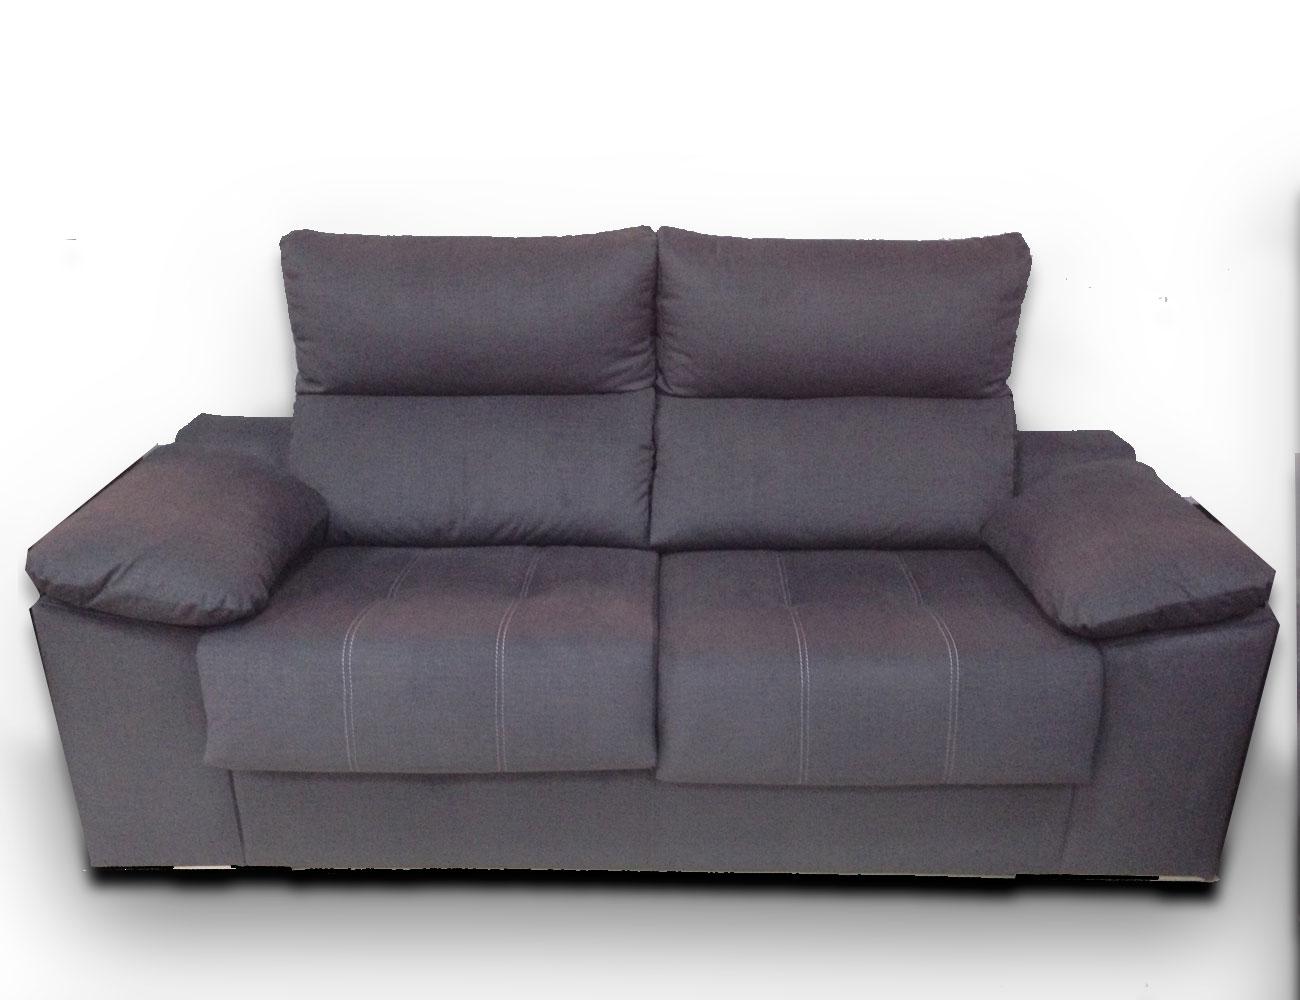 Sofa 3 plazas2